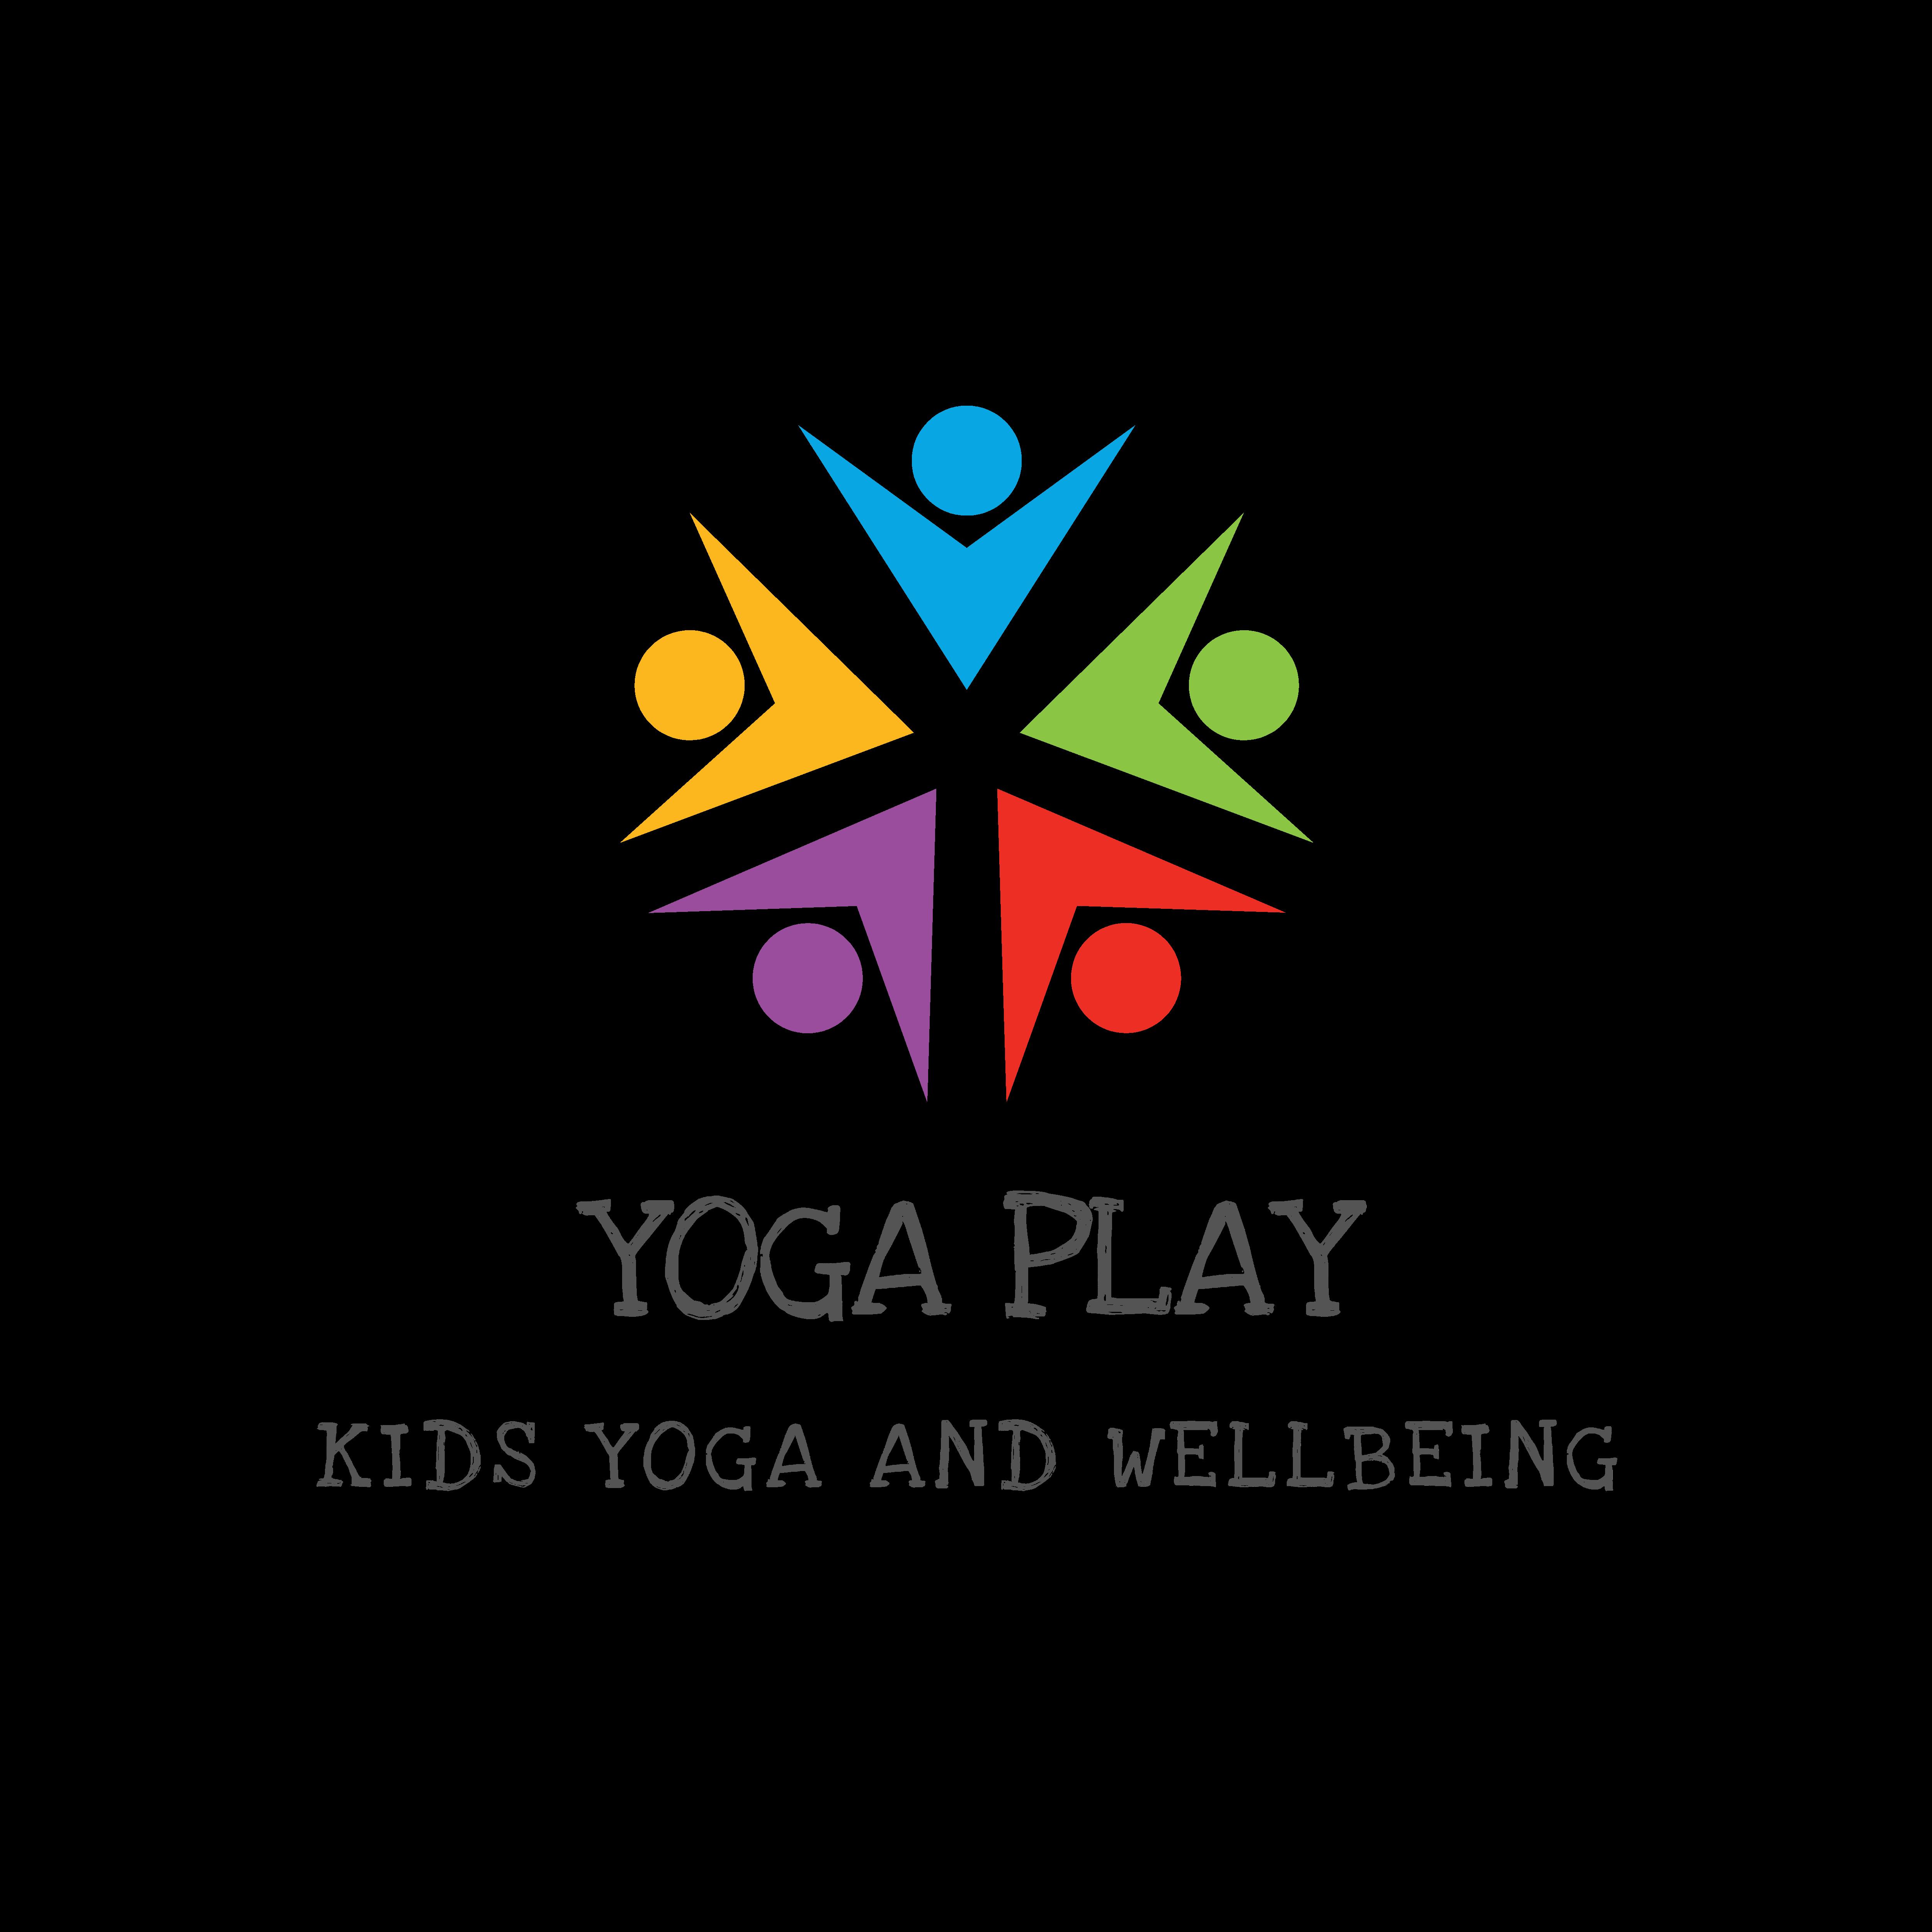 Trial Kids Yoga Class